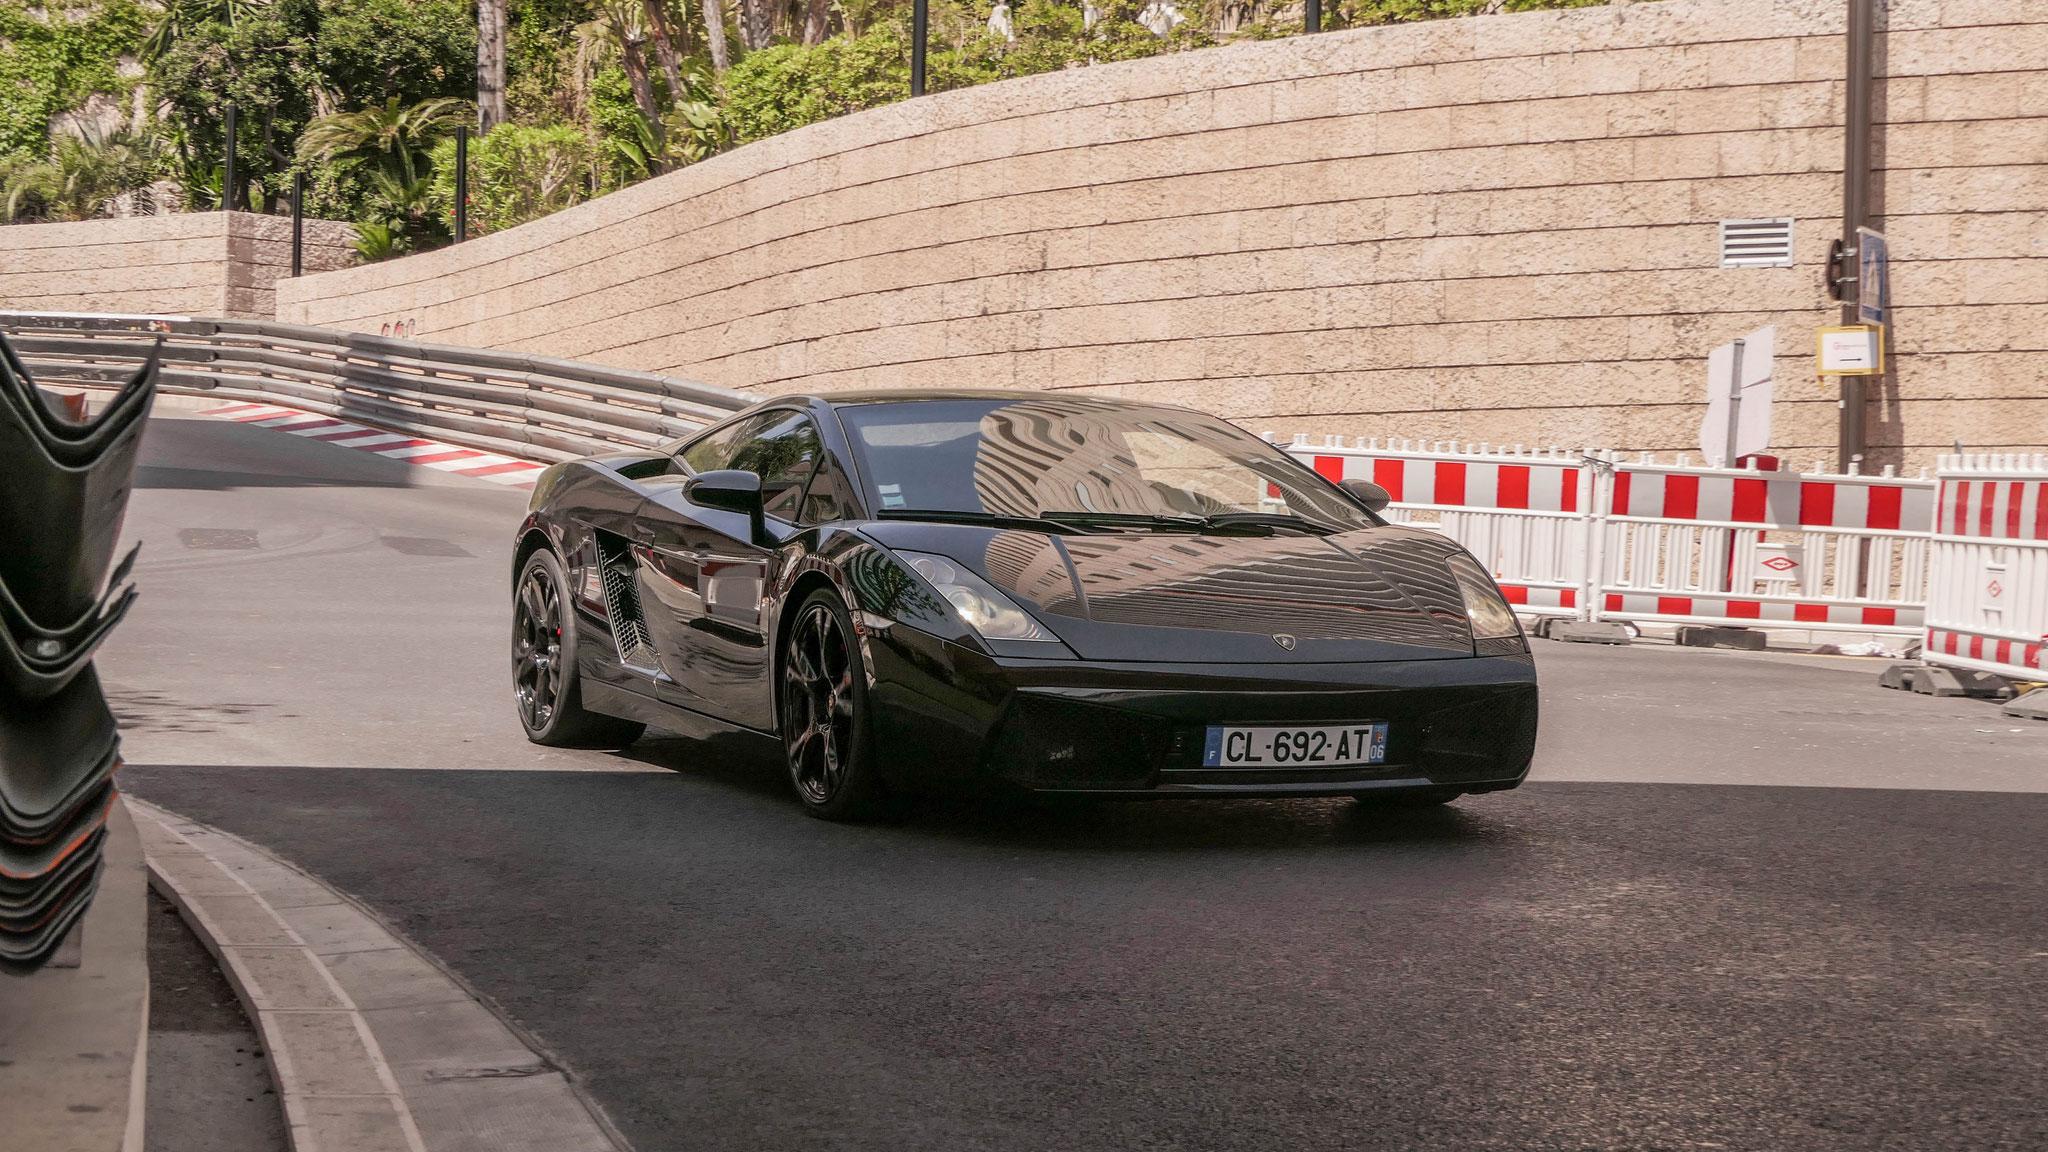 Lamborghini Gallardo Coupé - CL-692-AT-06 (FRA)